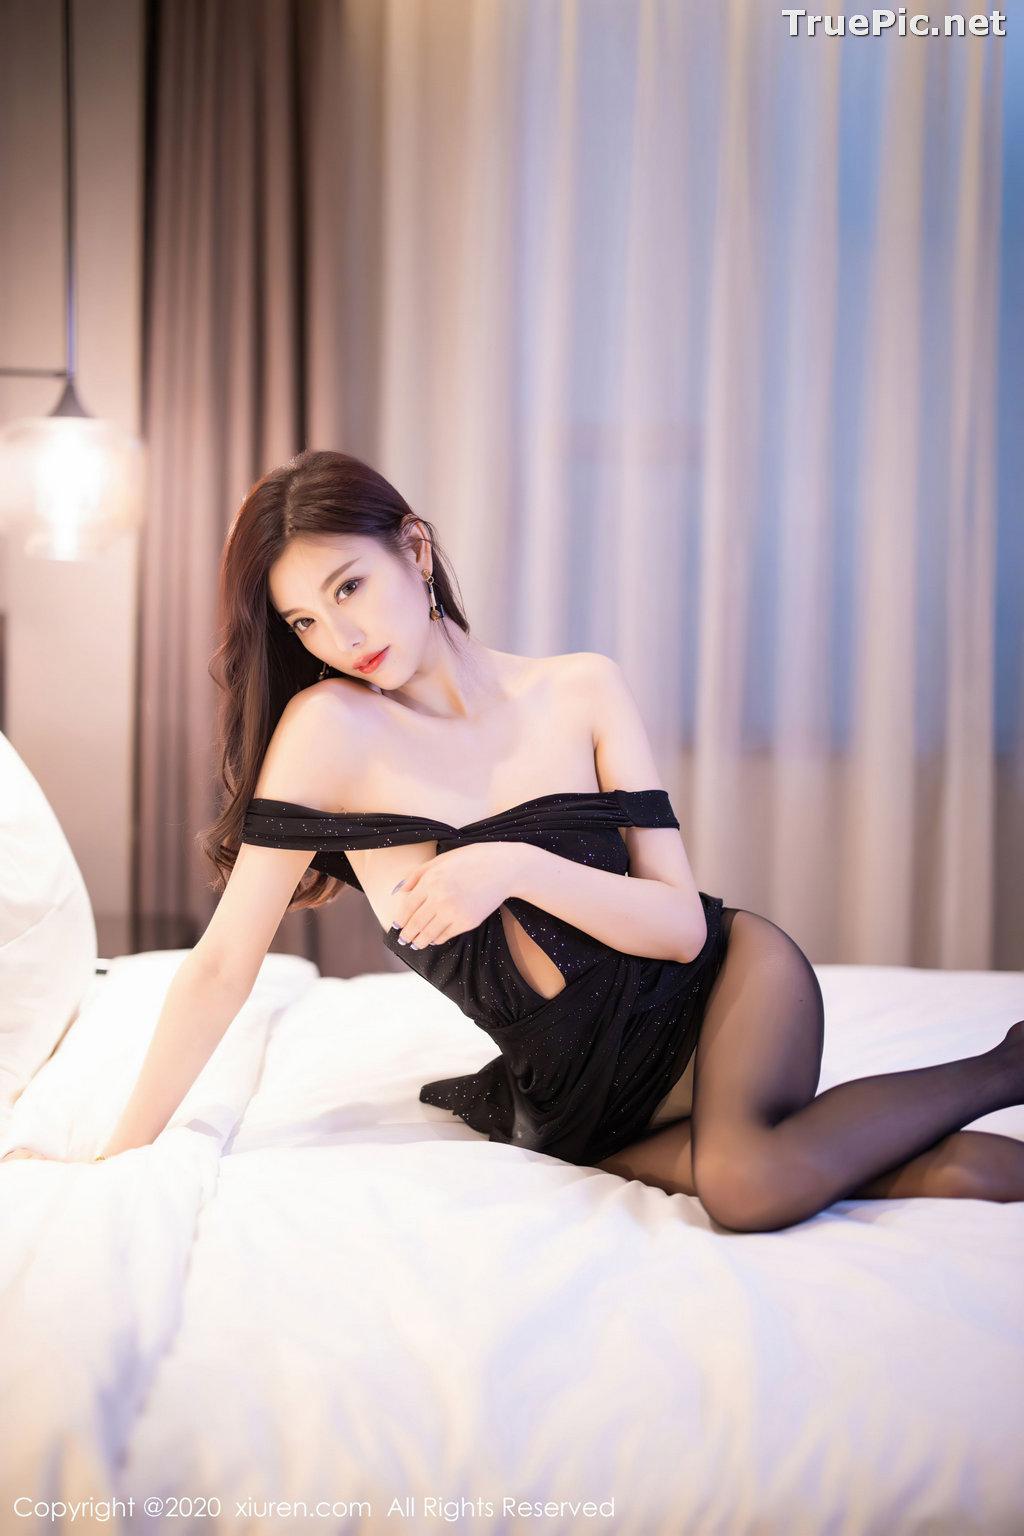 Image XIUREN No.2616 - Chinese Model - Yang Chen Chen (杨晨晨sugar) - Sexy Dark Lady - TruePic.net - Picture-3